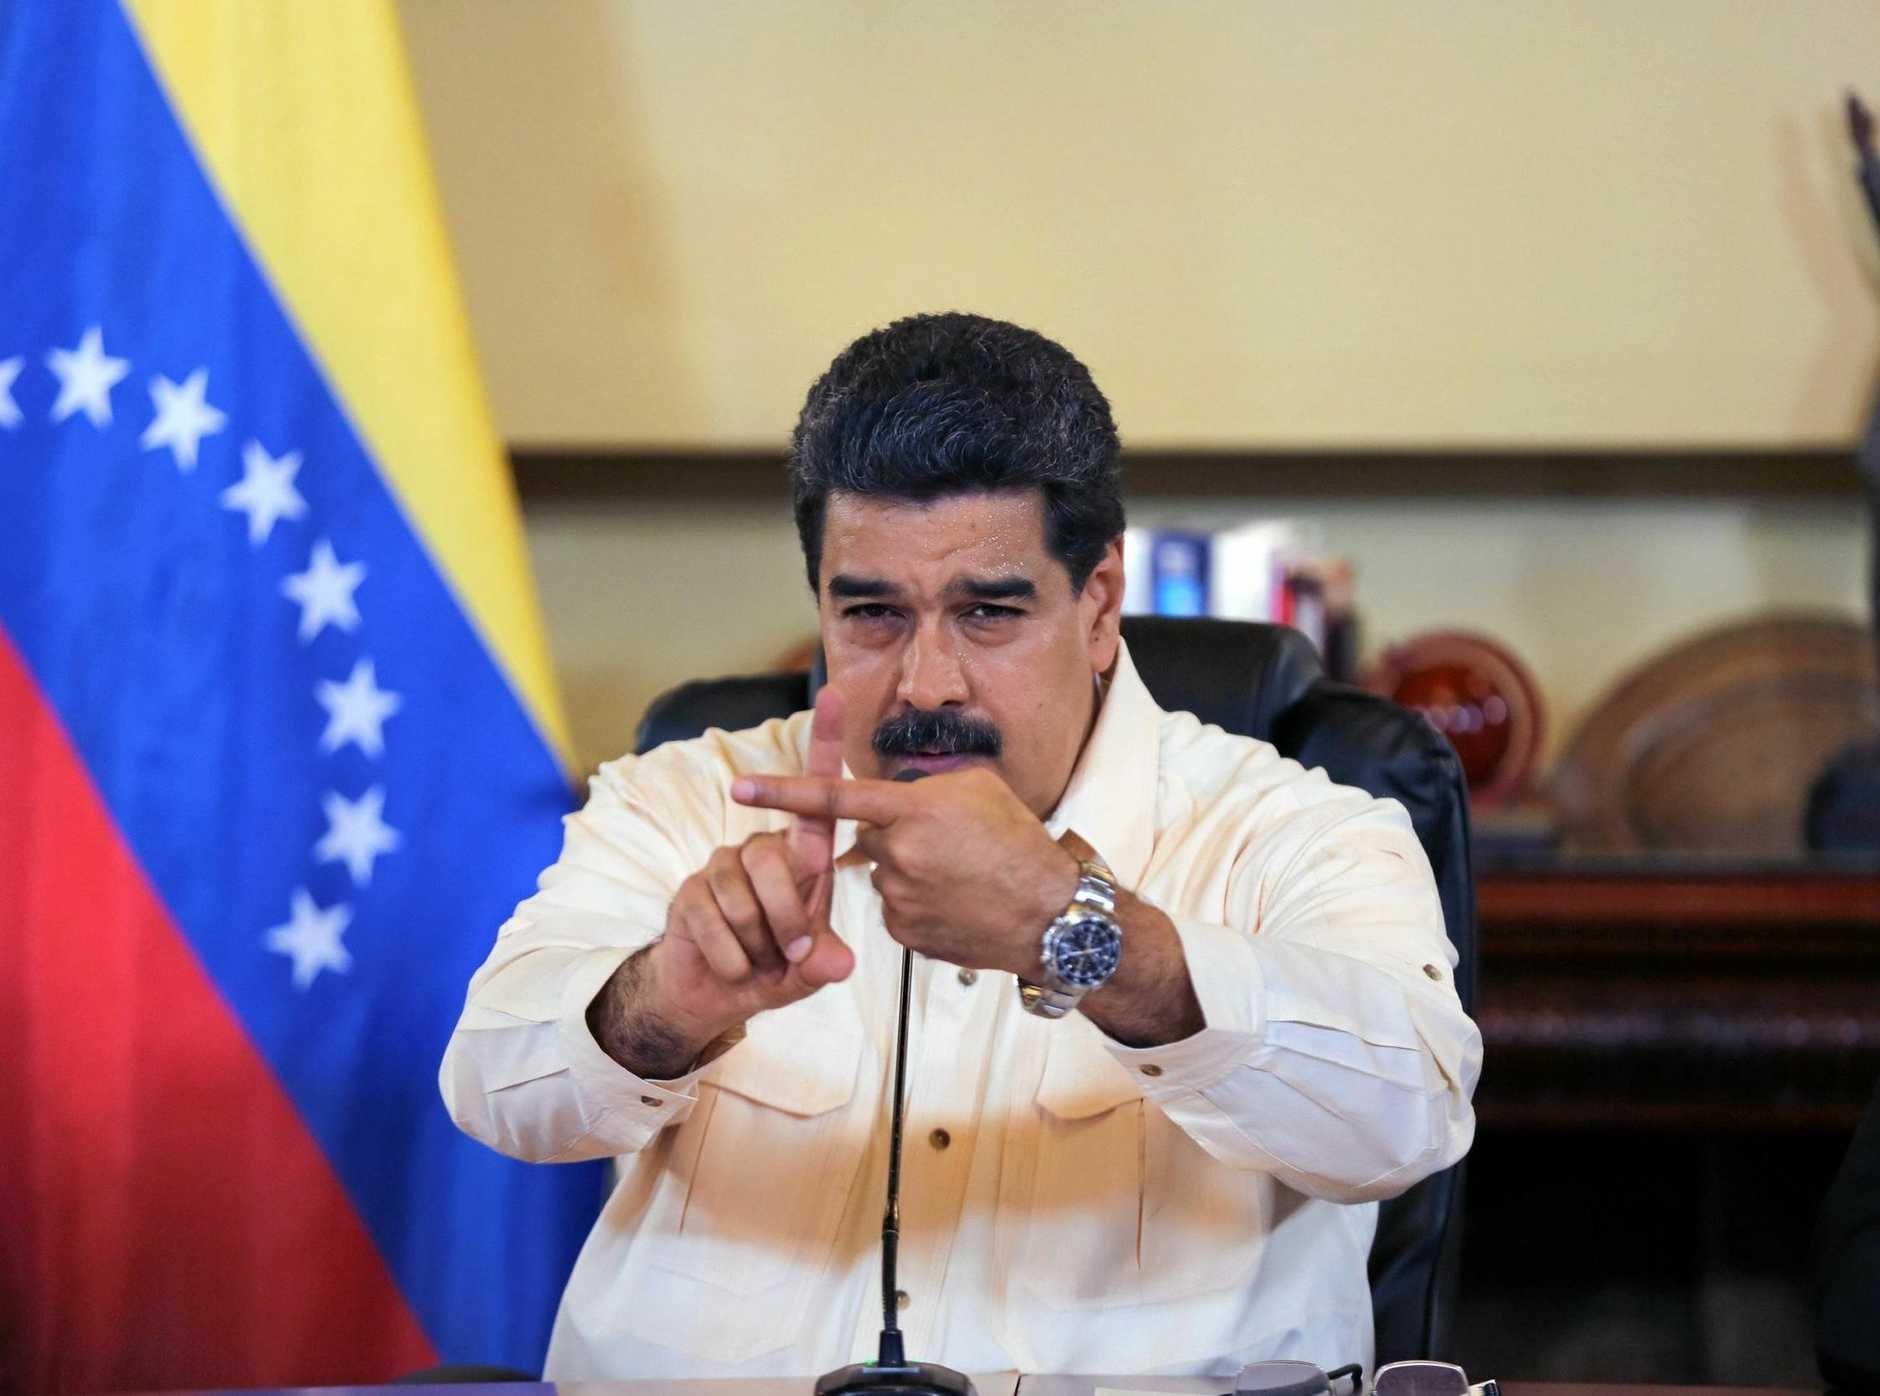 Venezuelan President Nicolas Maduro has denounced US President Donald Trump.